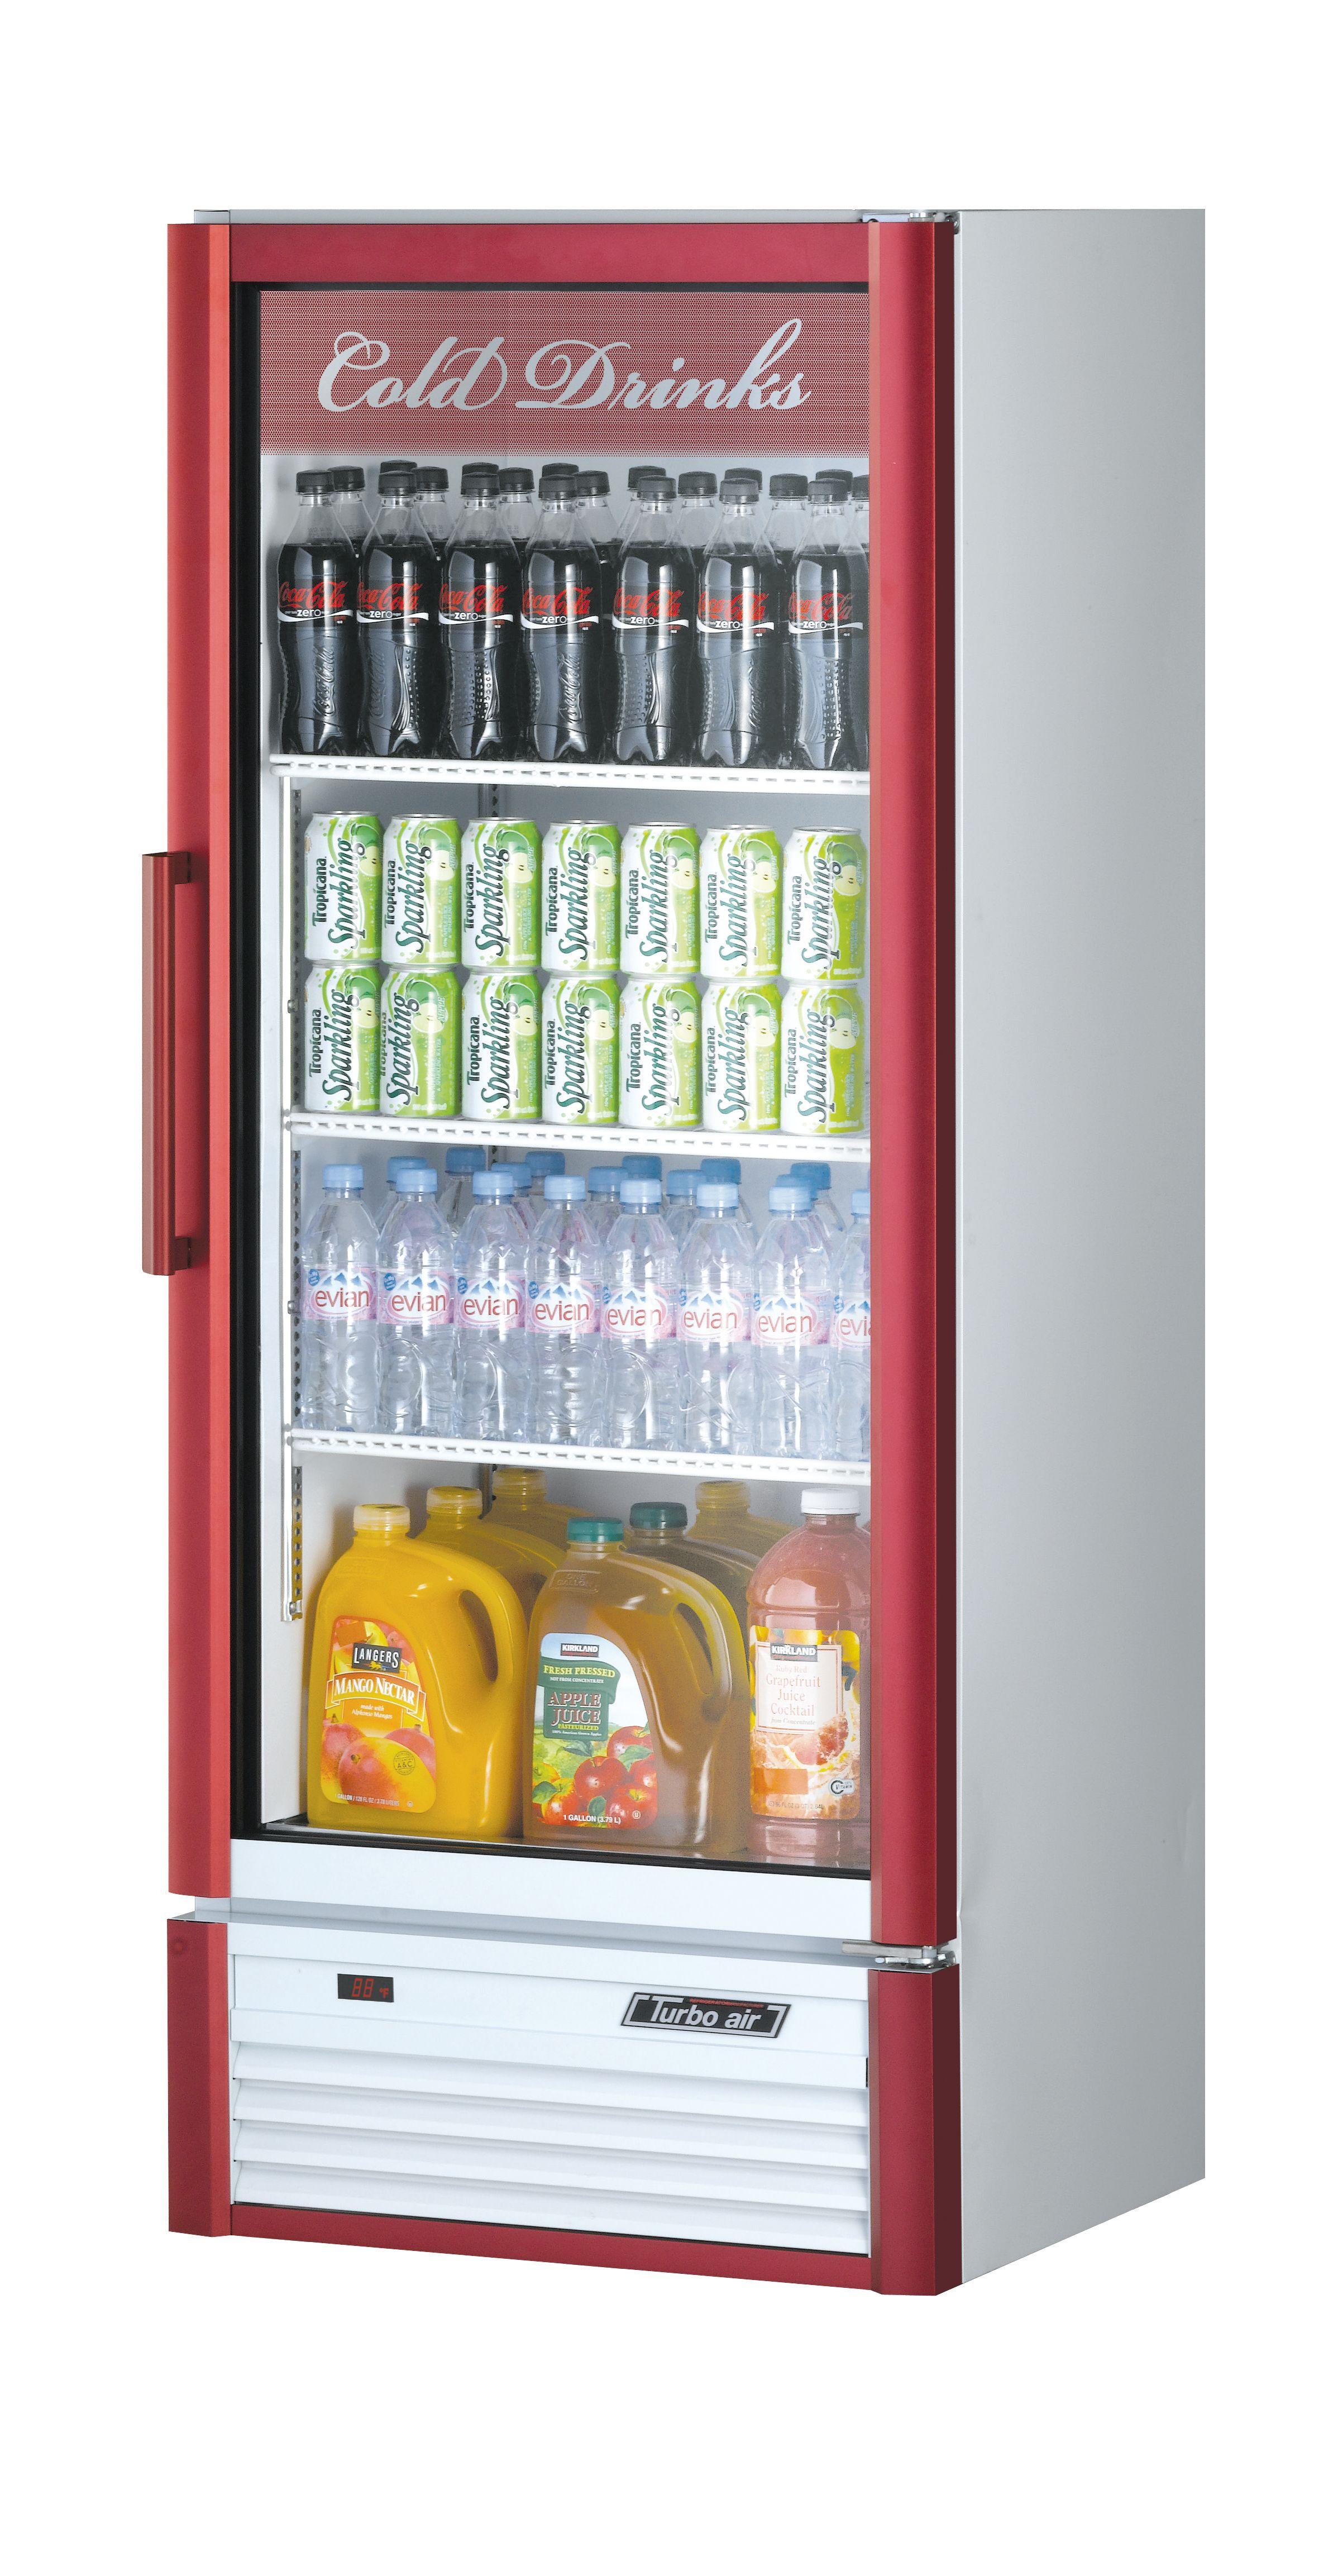 Refrigerator 11.3Cu. Ft., 1 Swing Door // Refrigerador 11